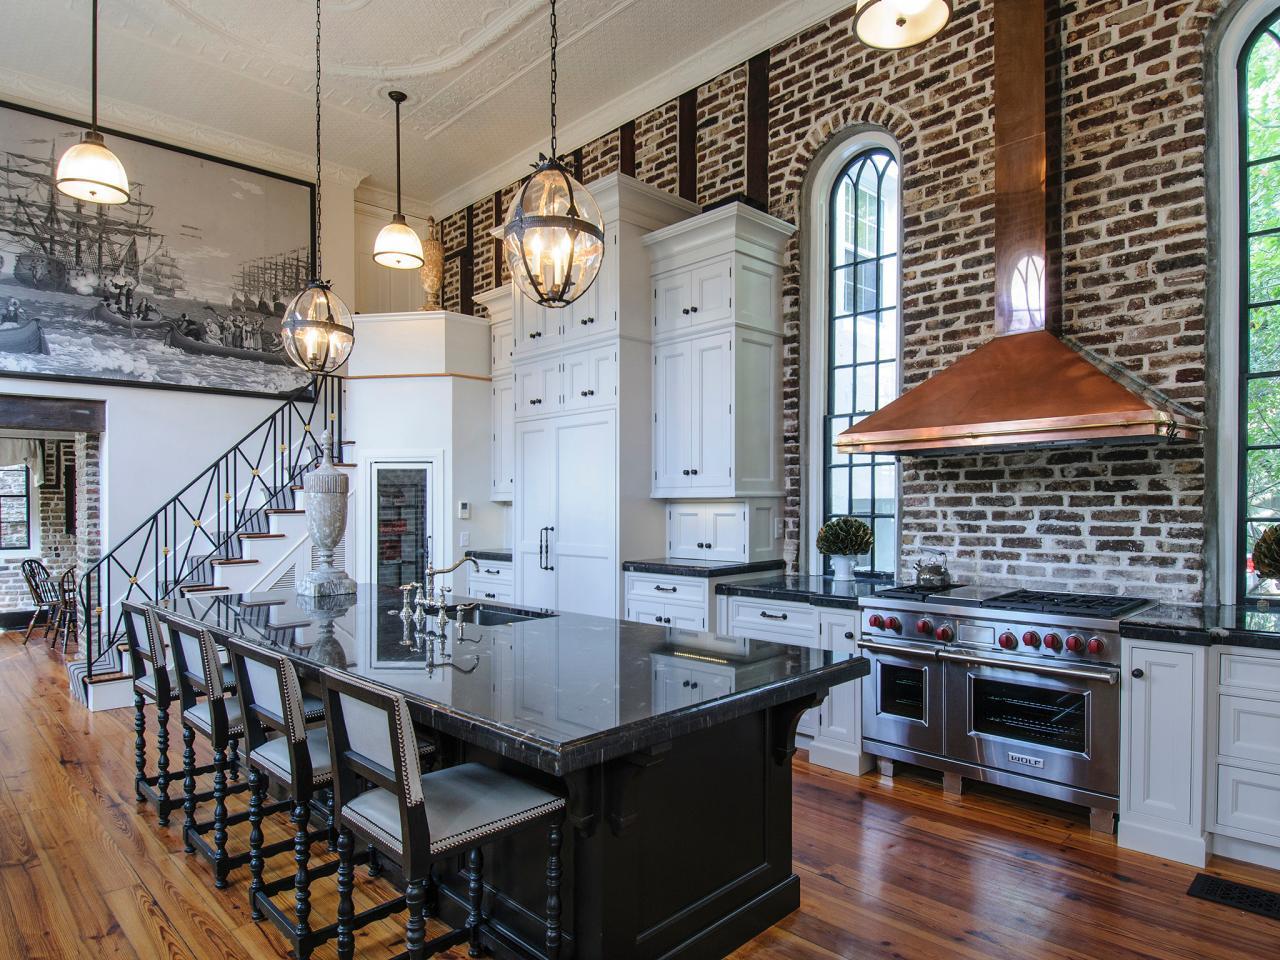 pinterest kitchen remodel ideas stone outdoor مطابخ تركي 2017 احدث ديكورات مودرن ميكساتك